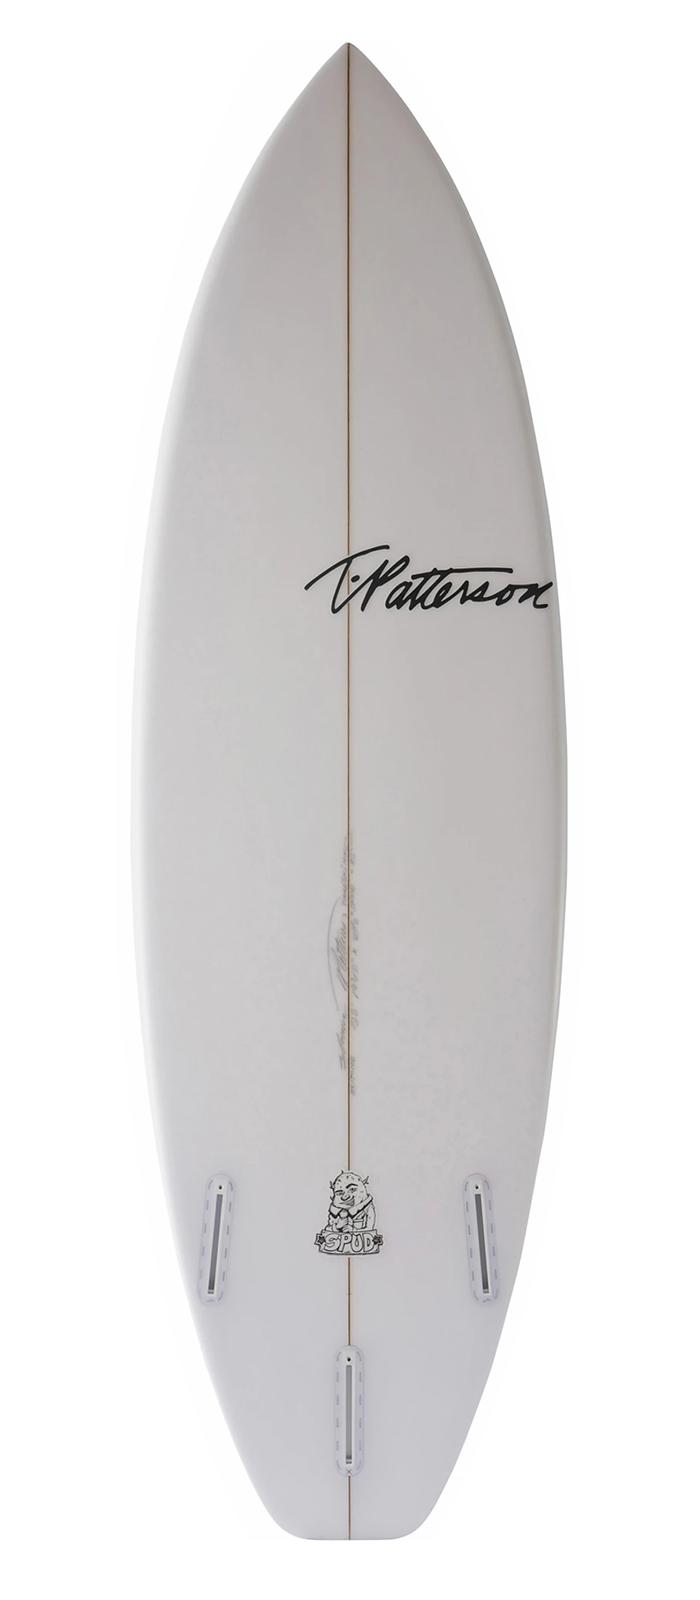 THE SPUD surfboard model bottom